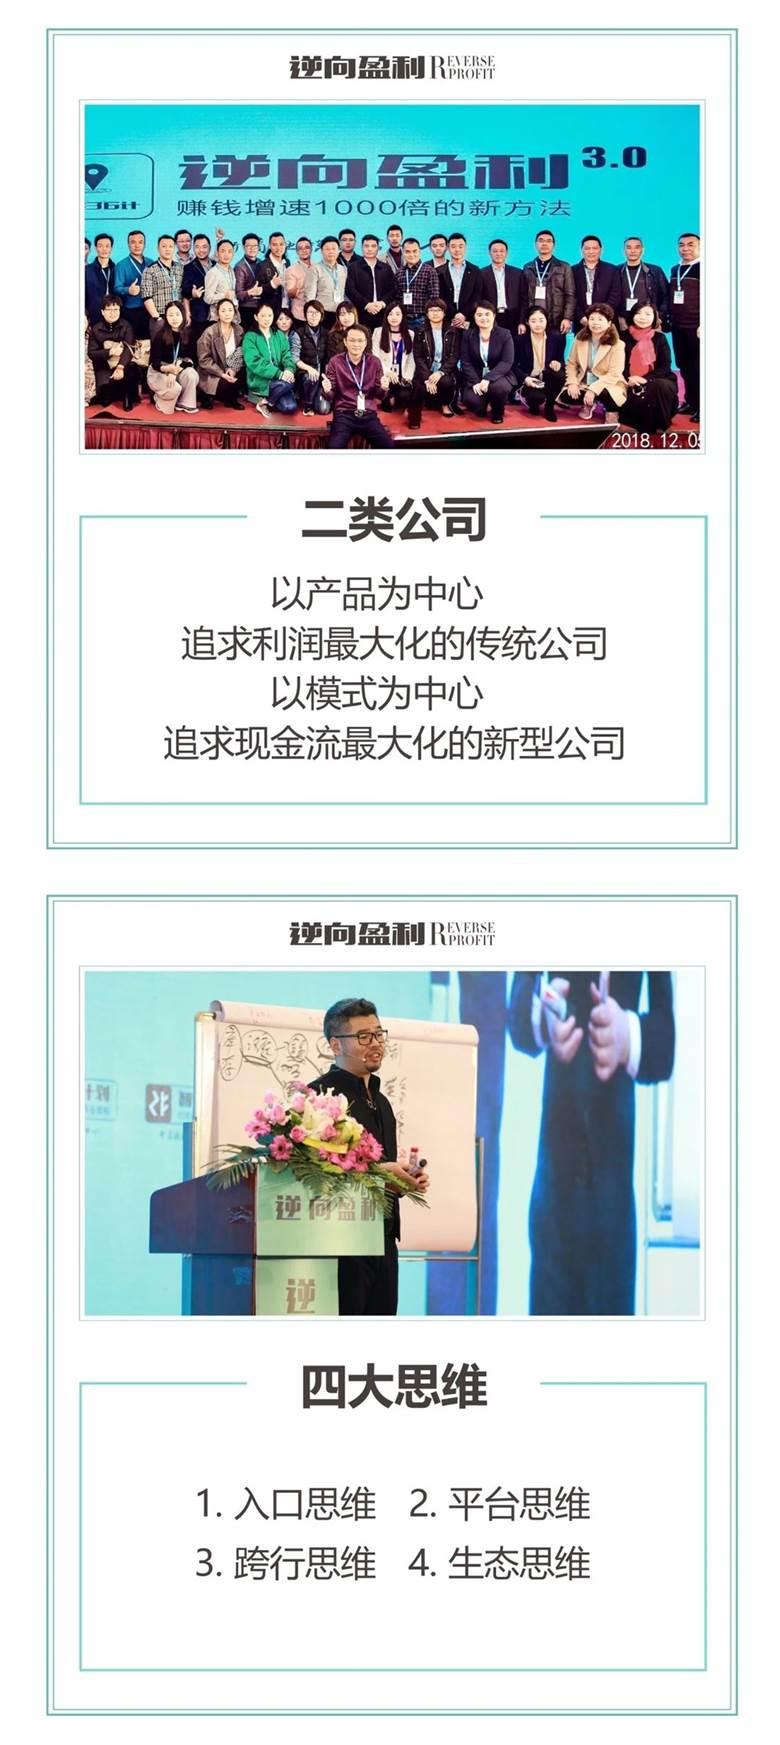 http://www.huodongxing.com/file/20191113/1063603644976/273667419105416.jpg